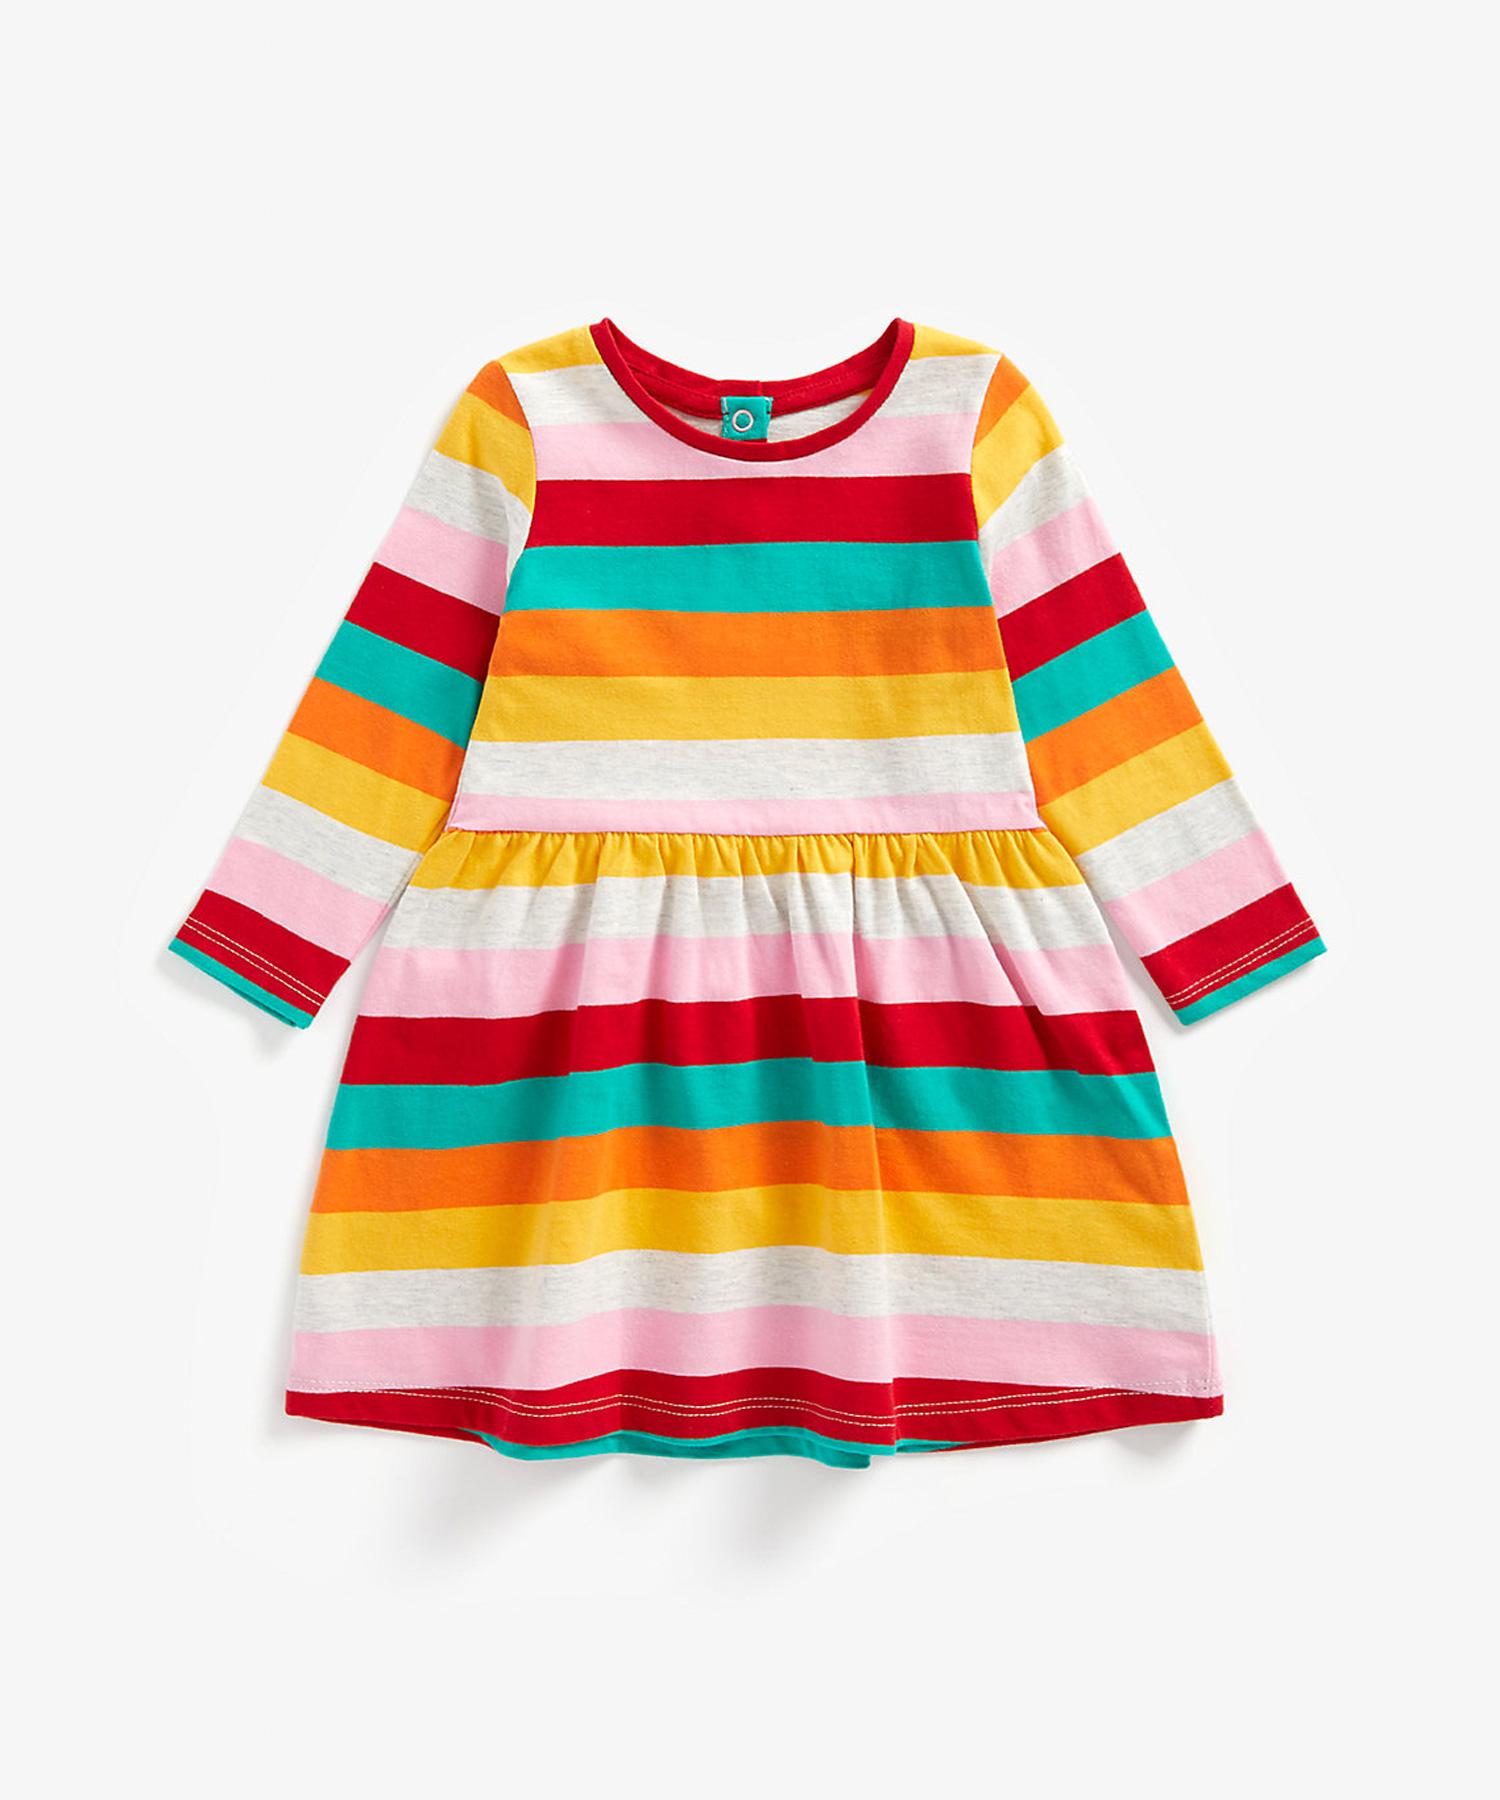 Mothercare | Girls Full Sleeves Dress Rainbow Stripes - Multicolor